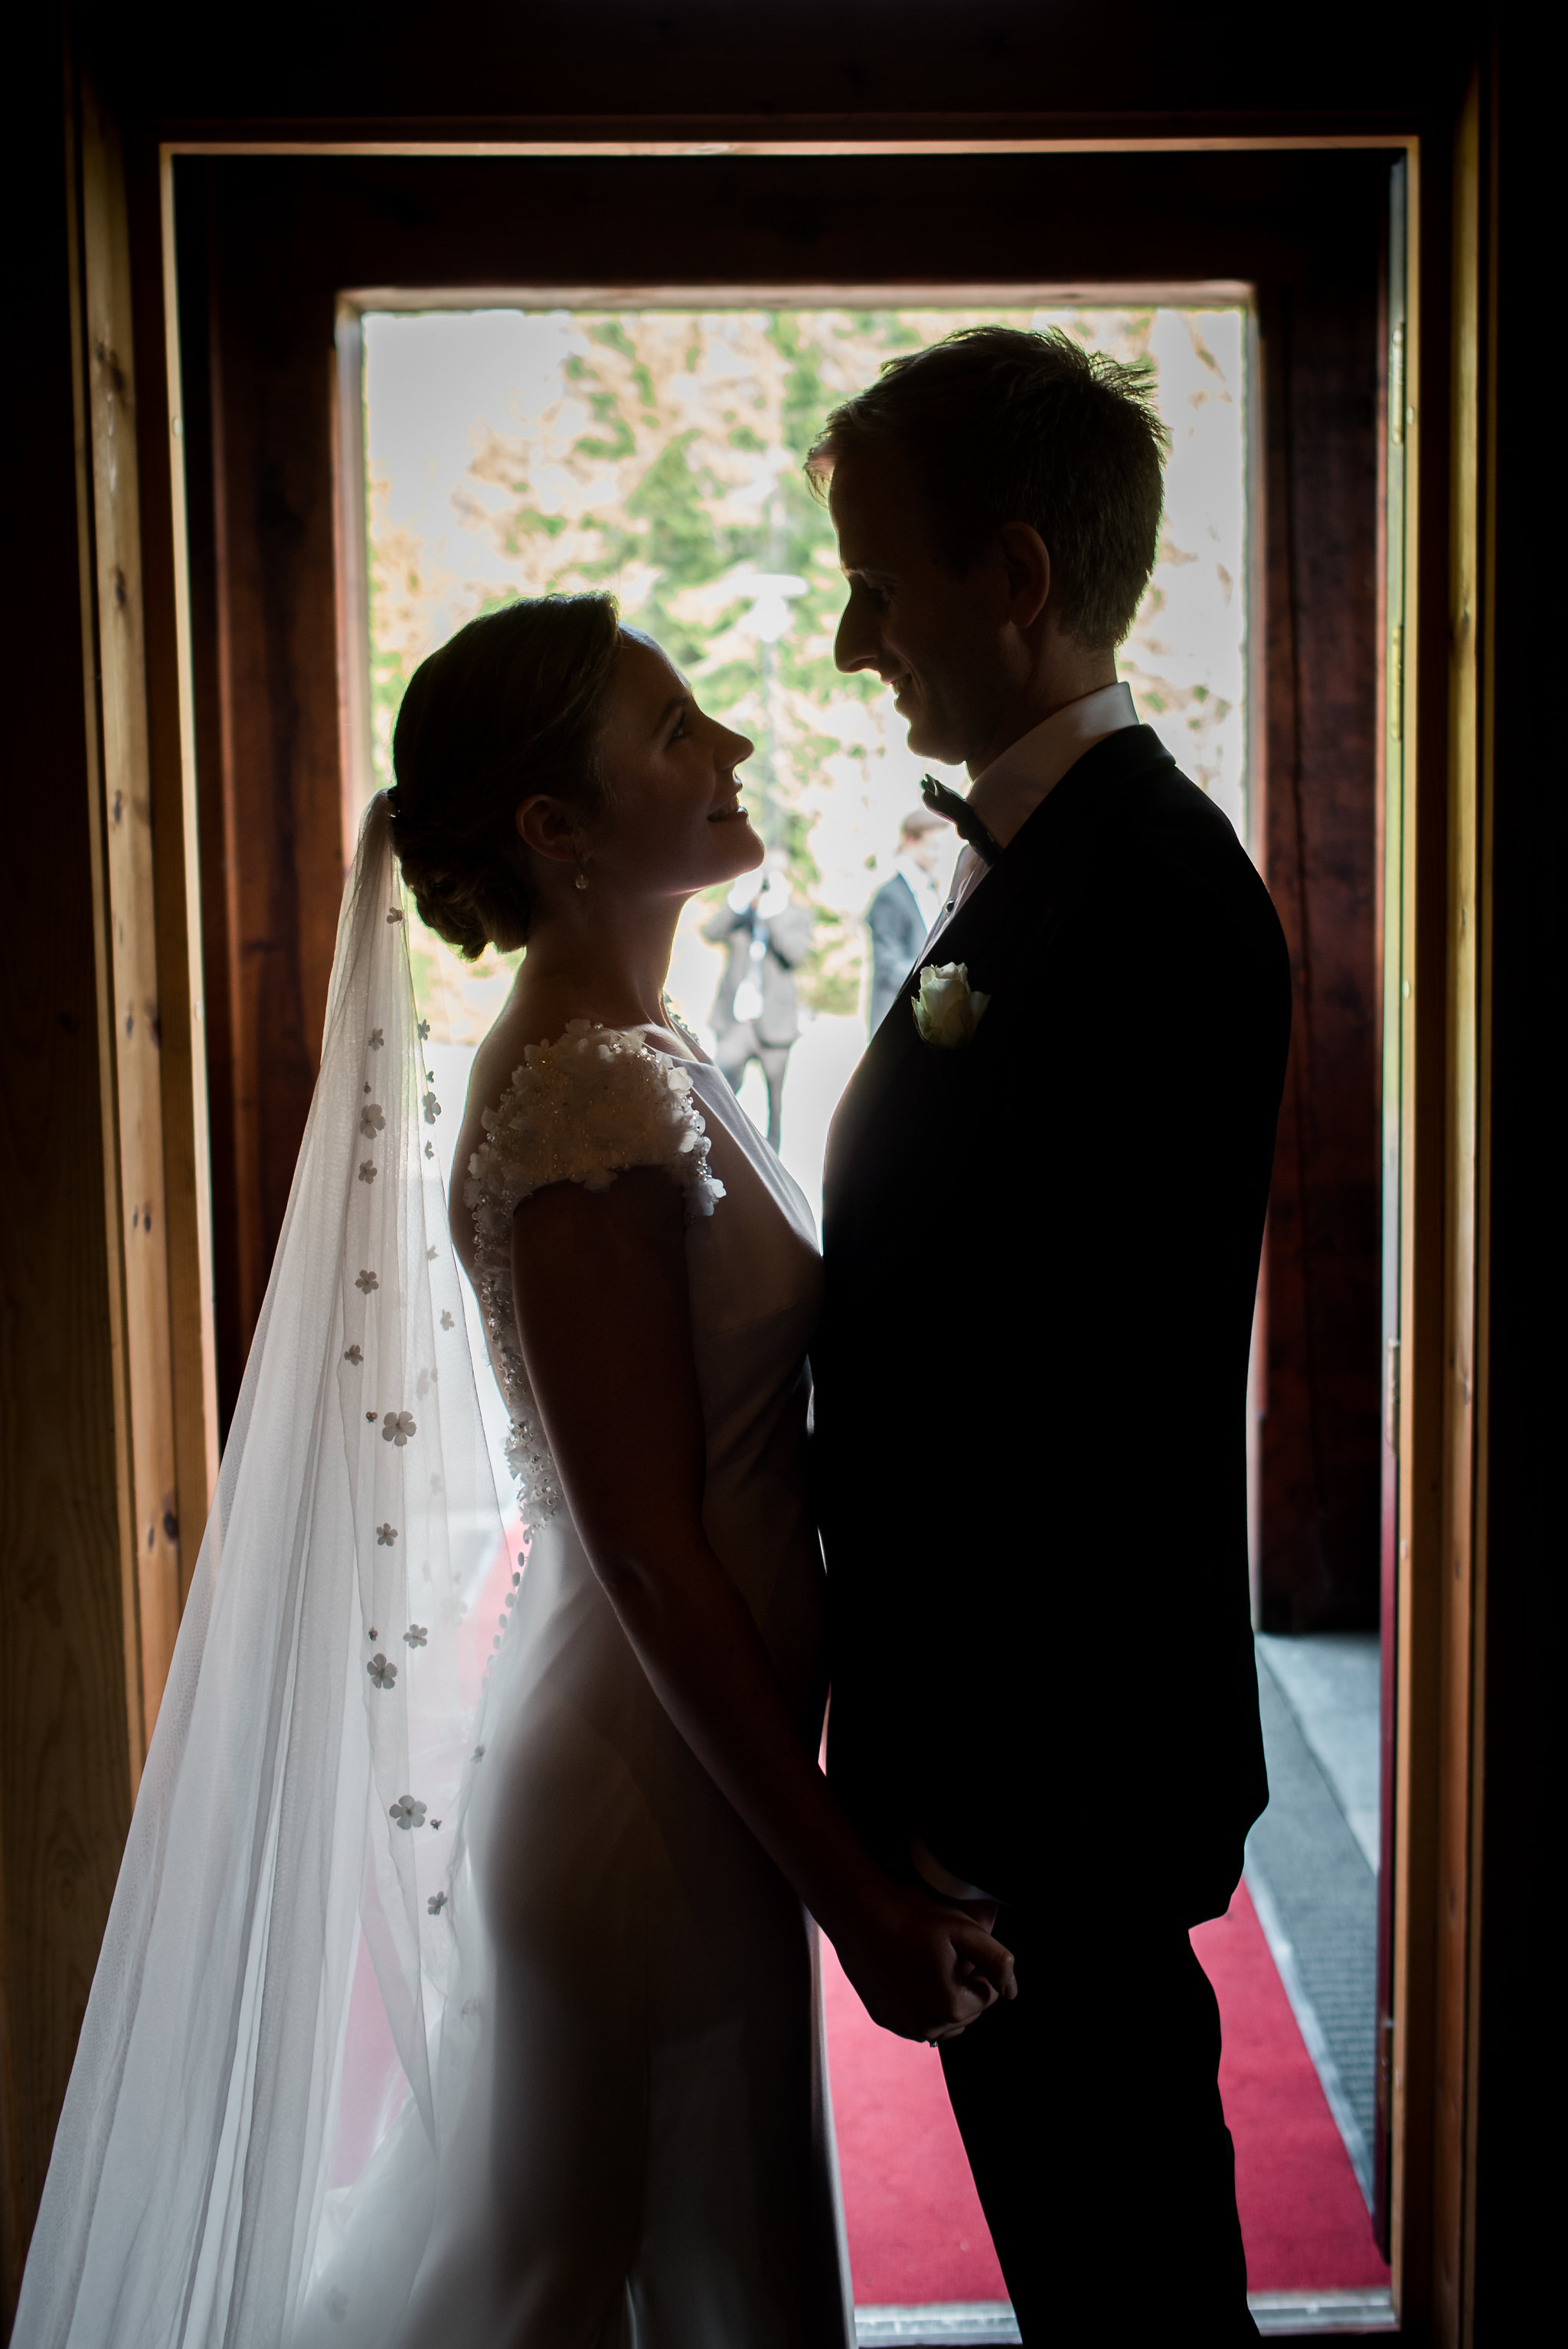 Pixlight-Bryllup-Nina-Thorbjorn604fotograf-holmekolen-oslo.jpg